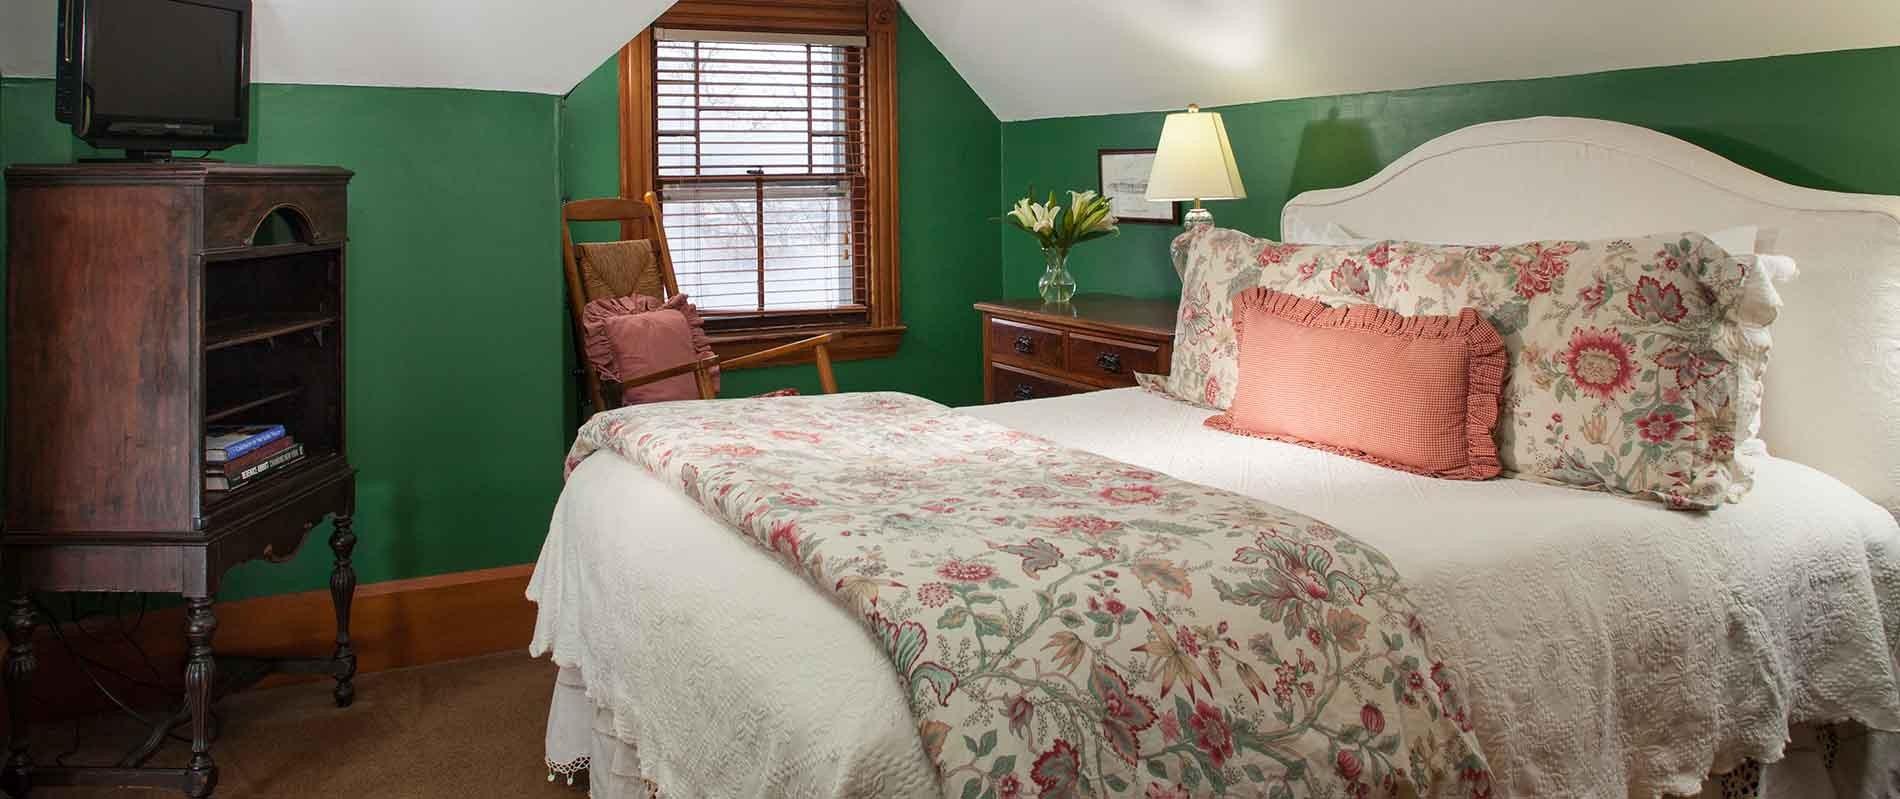 Beautiful room in a Burlington B&B